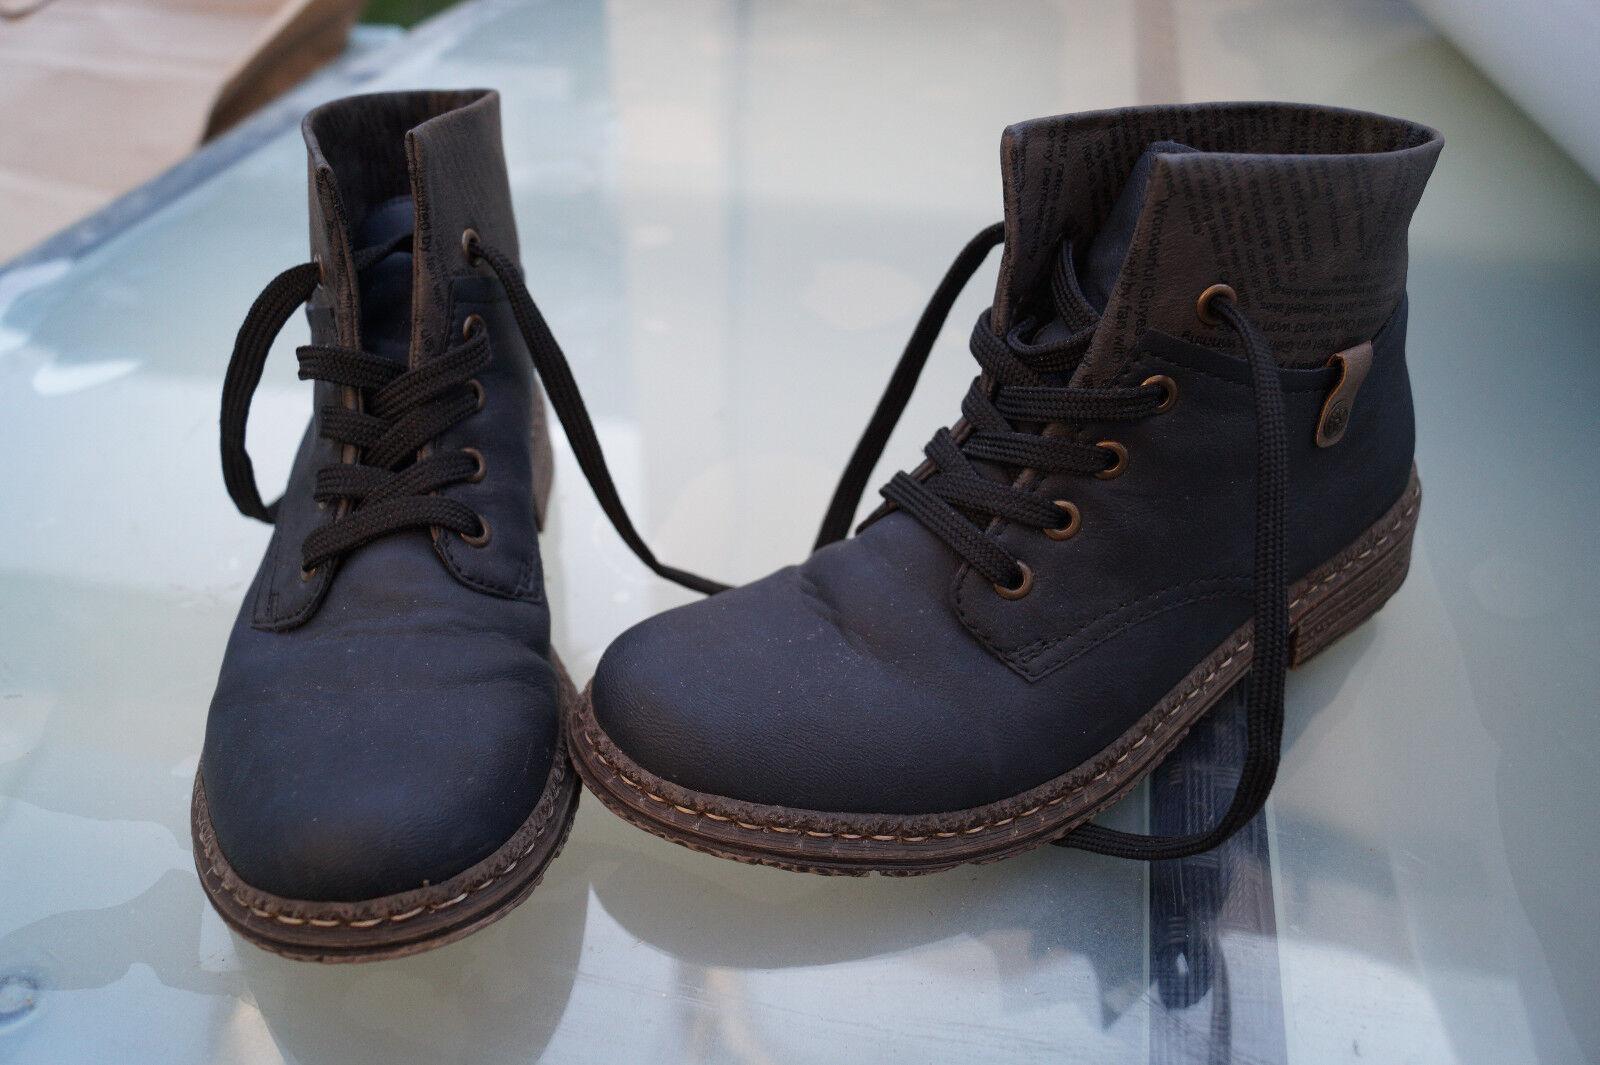 RIEKER Damen Winter Gr.38 Schuhe Stiefel Stiefeletten Boots Gr.38 Winter marine wie Neu #49 766b34